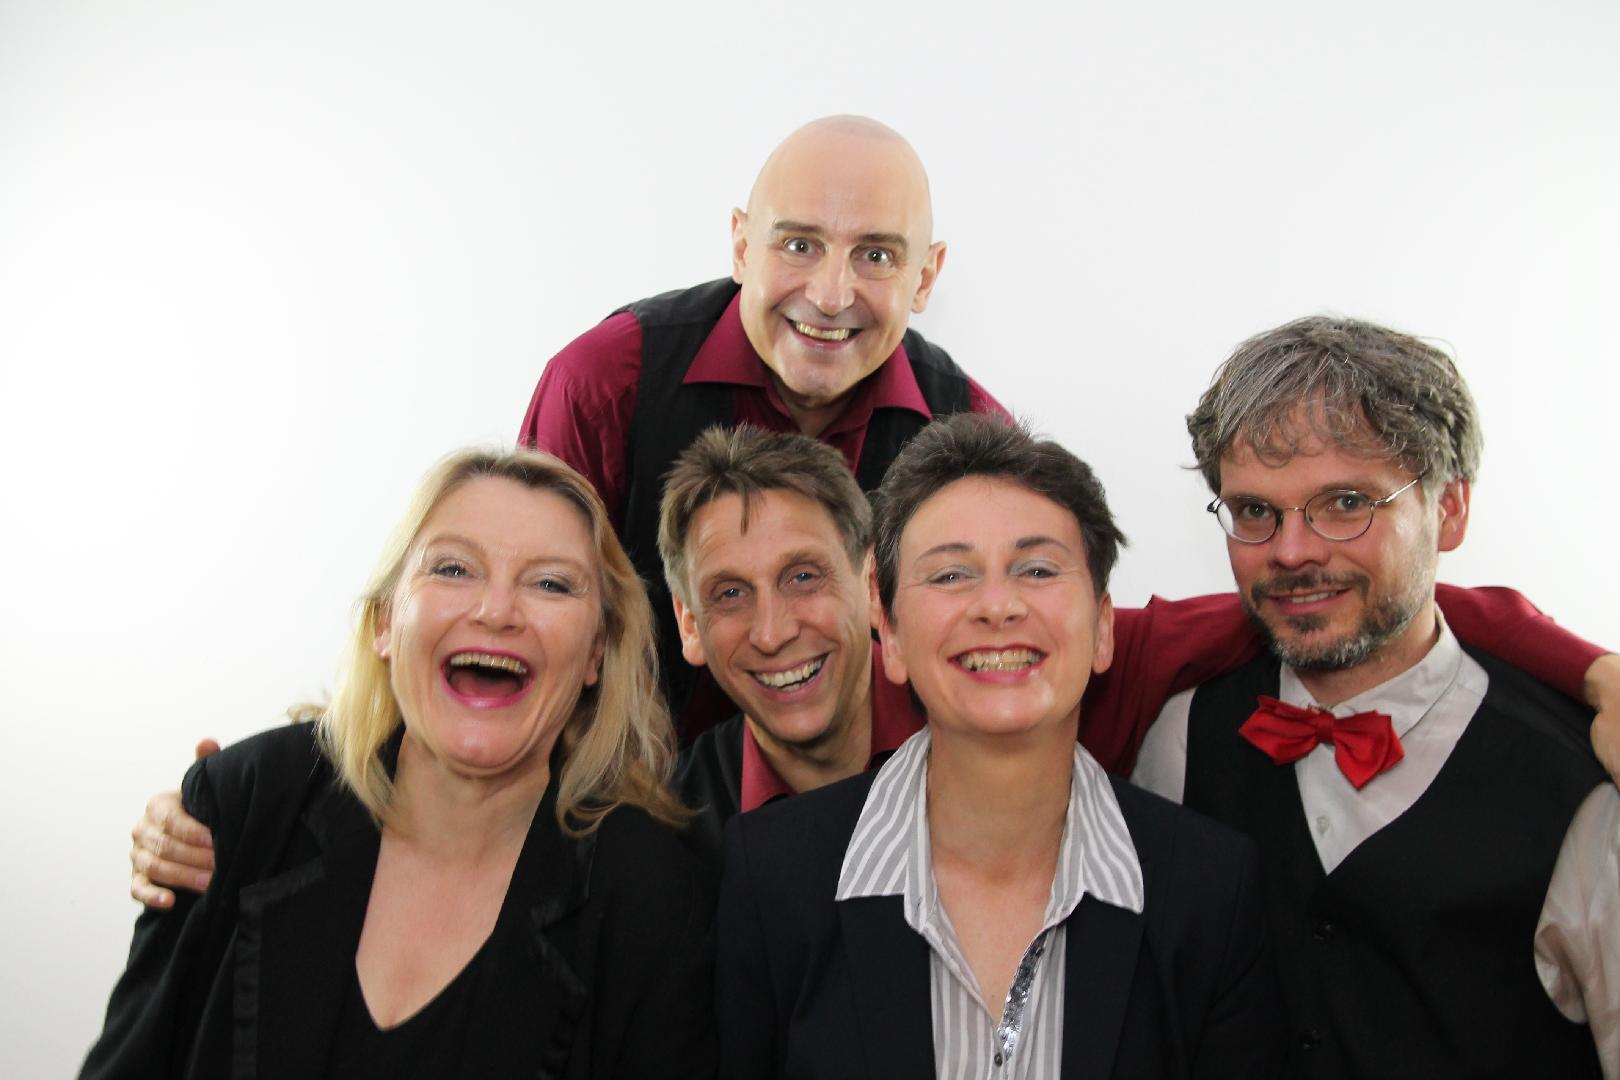 Kabarettensemble Leipziger Funzel